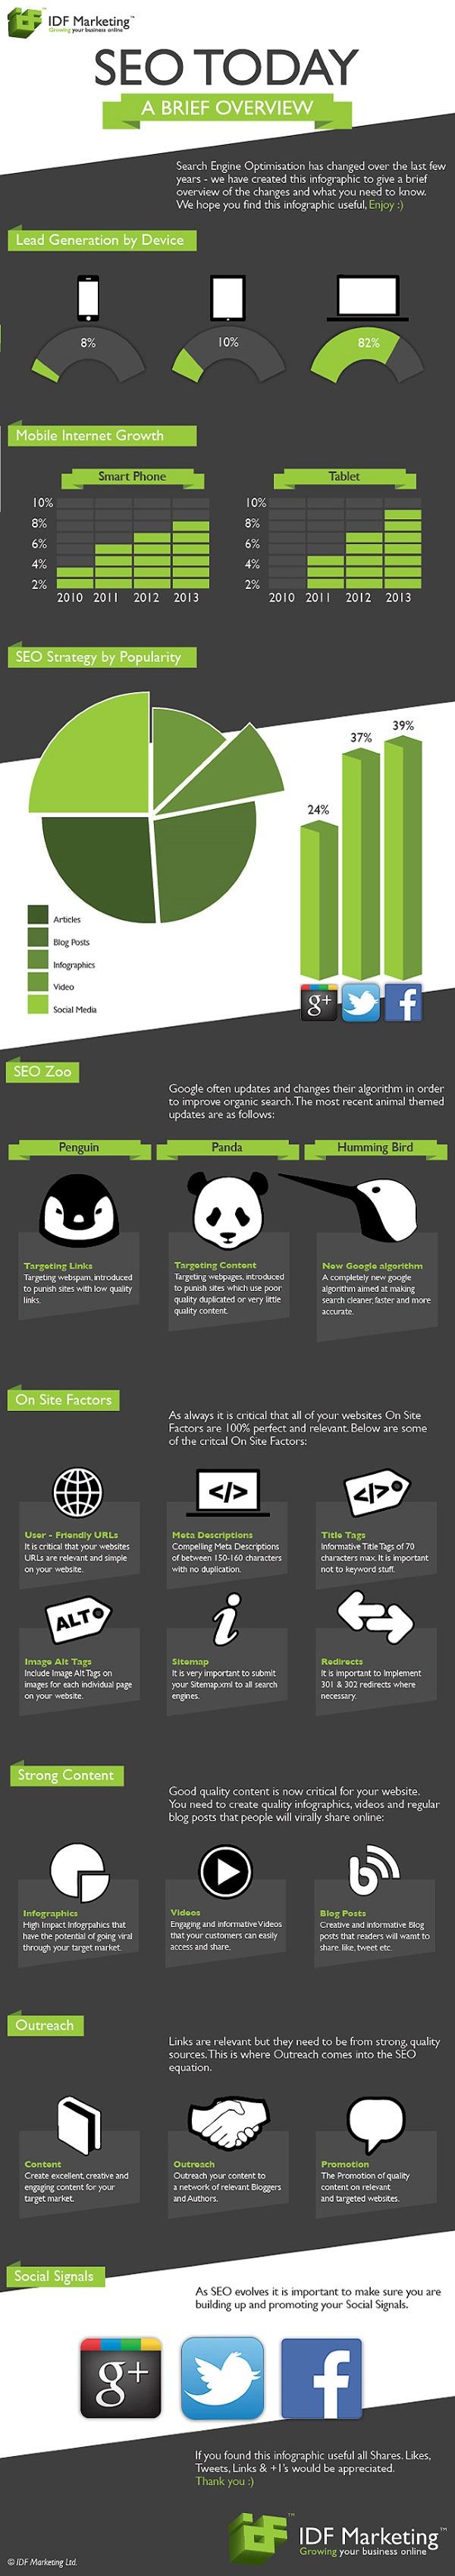 infografia seo 2014 guia